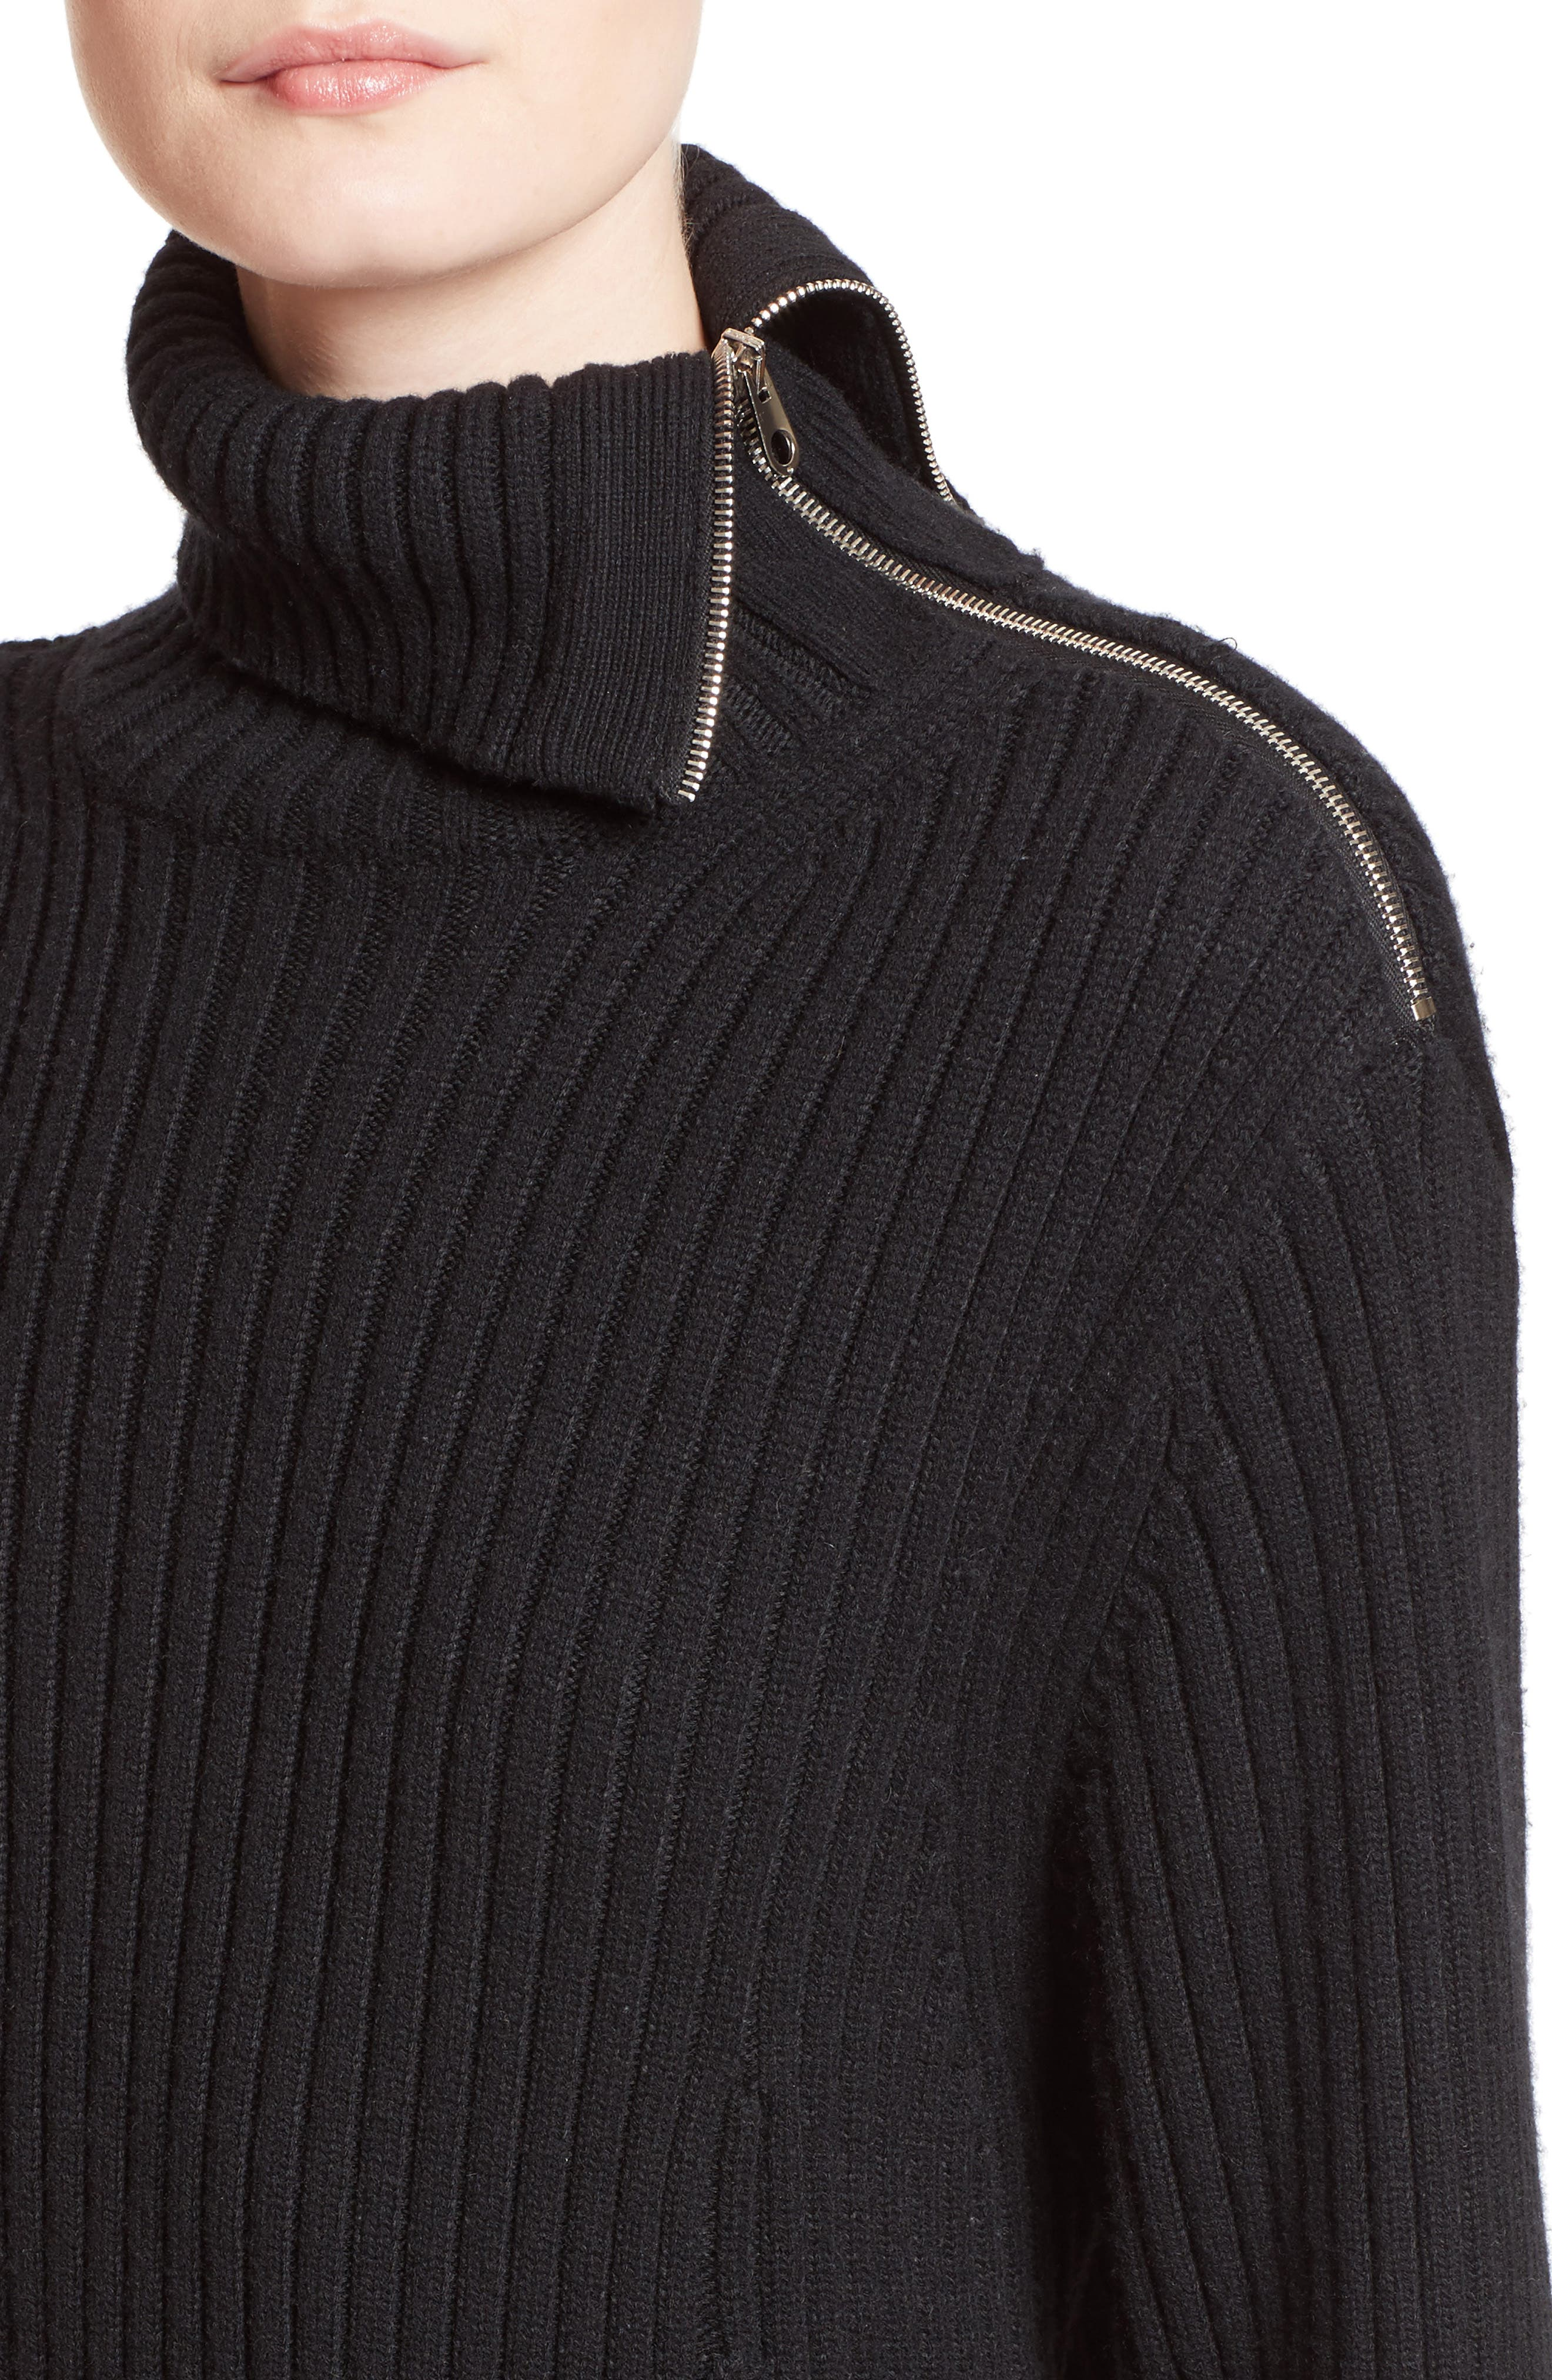 Wool & Cashmere Blend Turtleneck Dress,                             Alternate thumbnail 5, color,                             Black